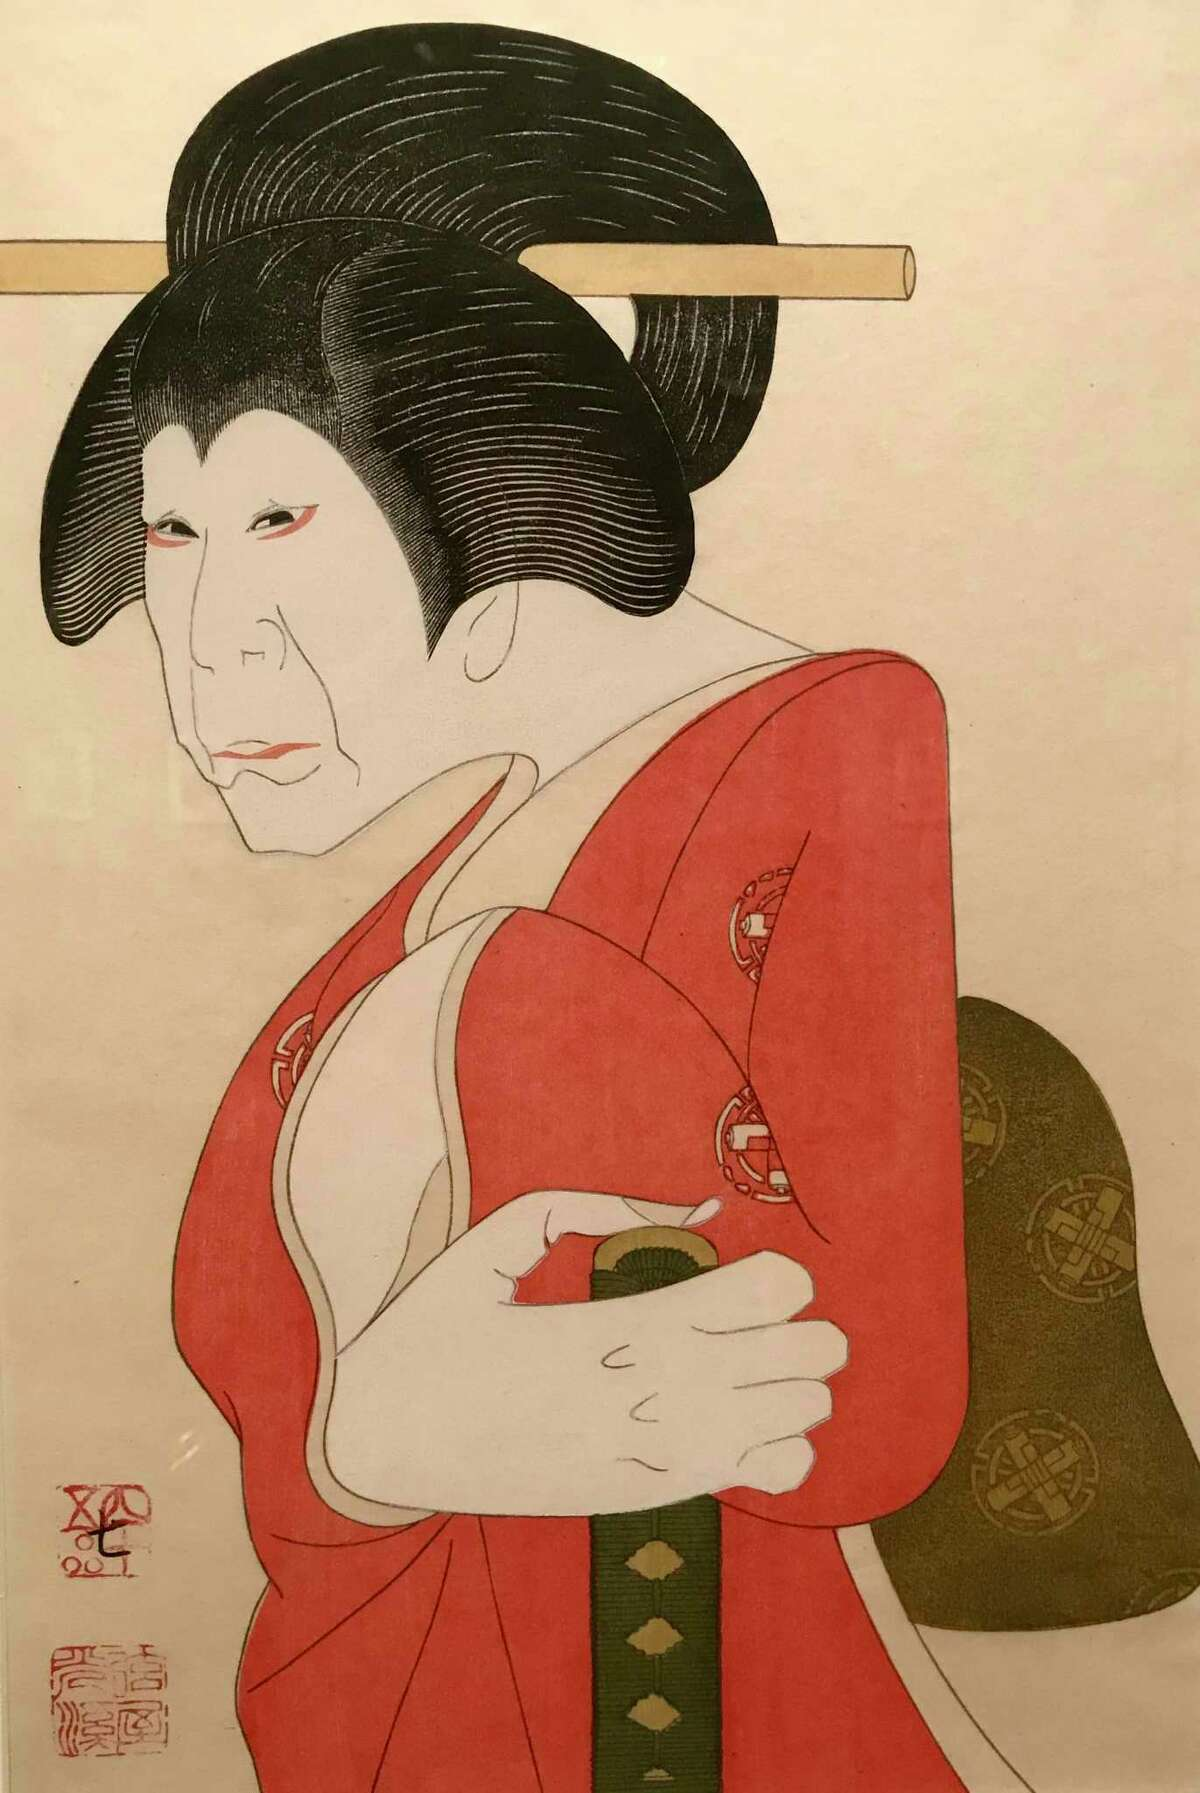 A Tsuruya Kokei print from 1984 exudes graceful humanity.